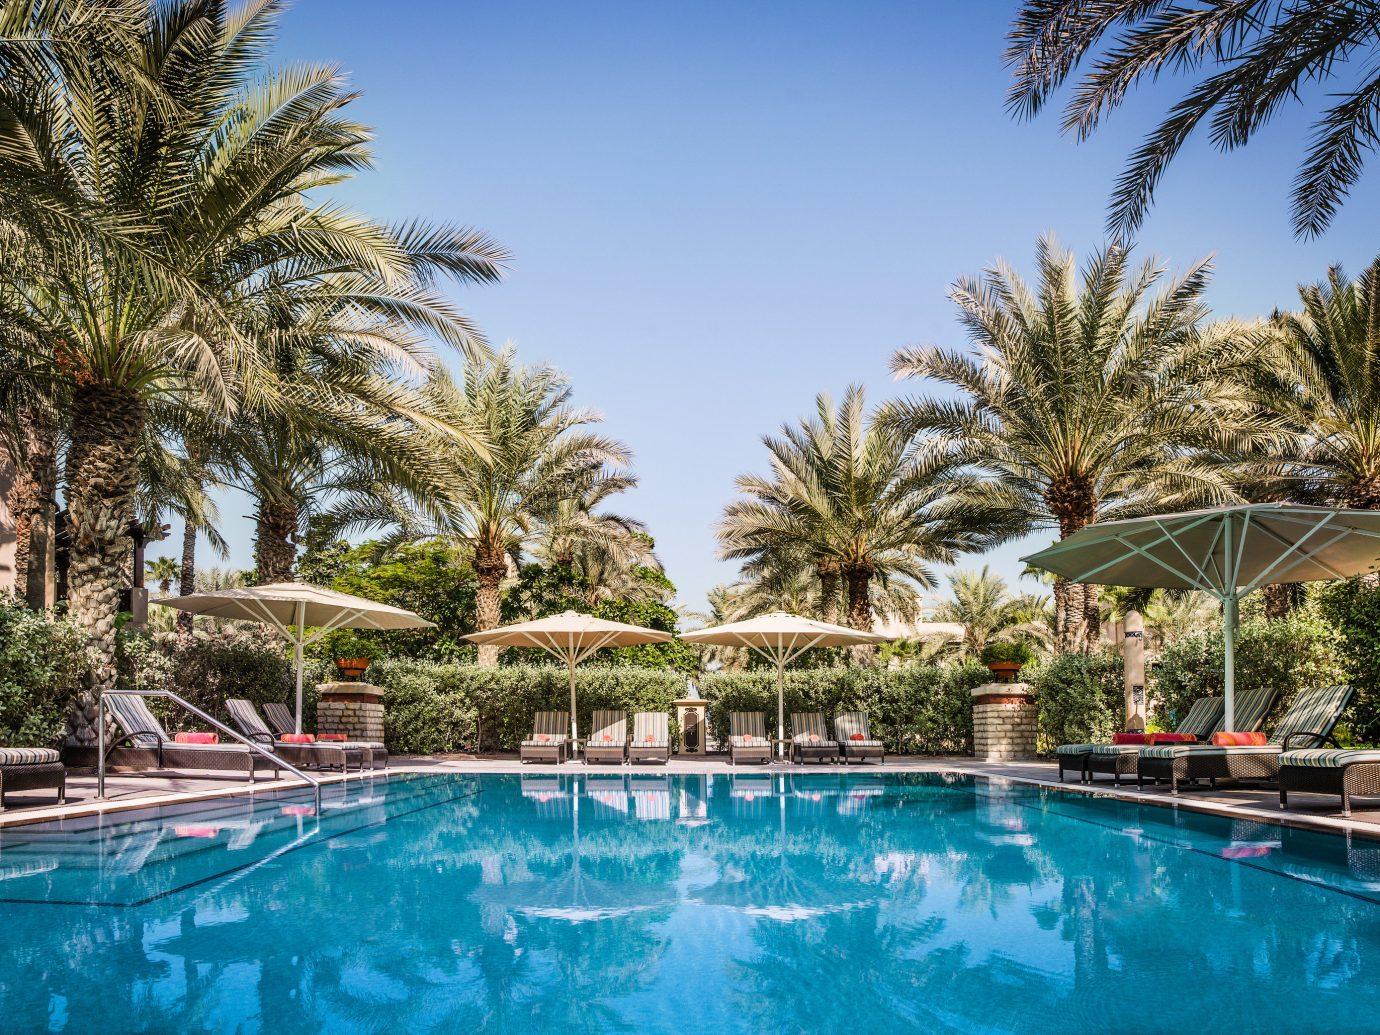 Dubai Hotels Luxury Travel Middle East Resort swimming pool property palm tree arecales tree water leisure real estate plant estate Villa sky vacation hotel resort town tropics hacienda tourism